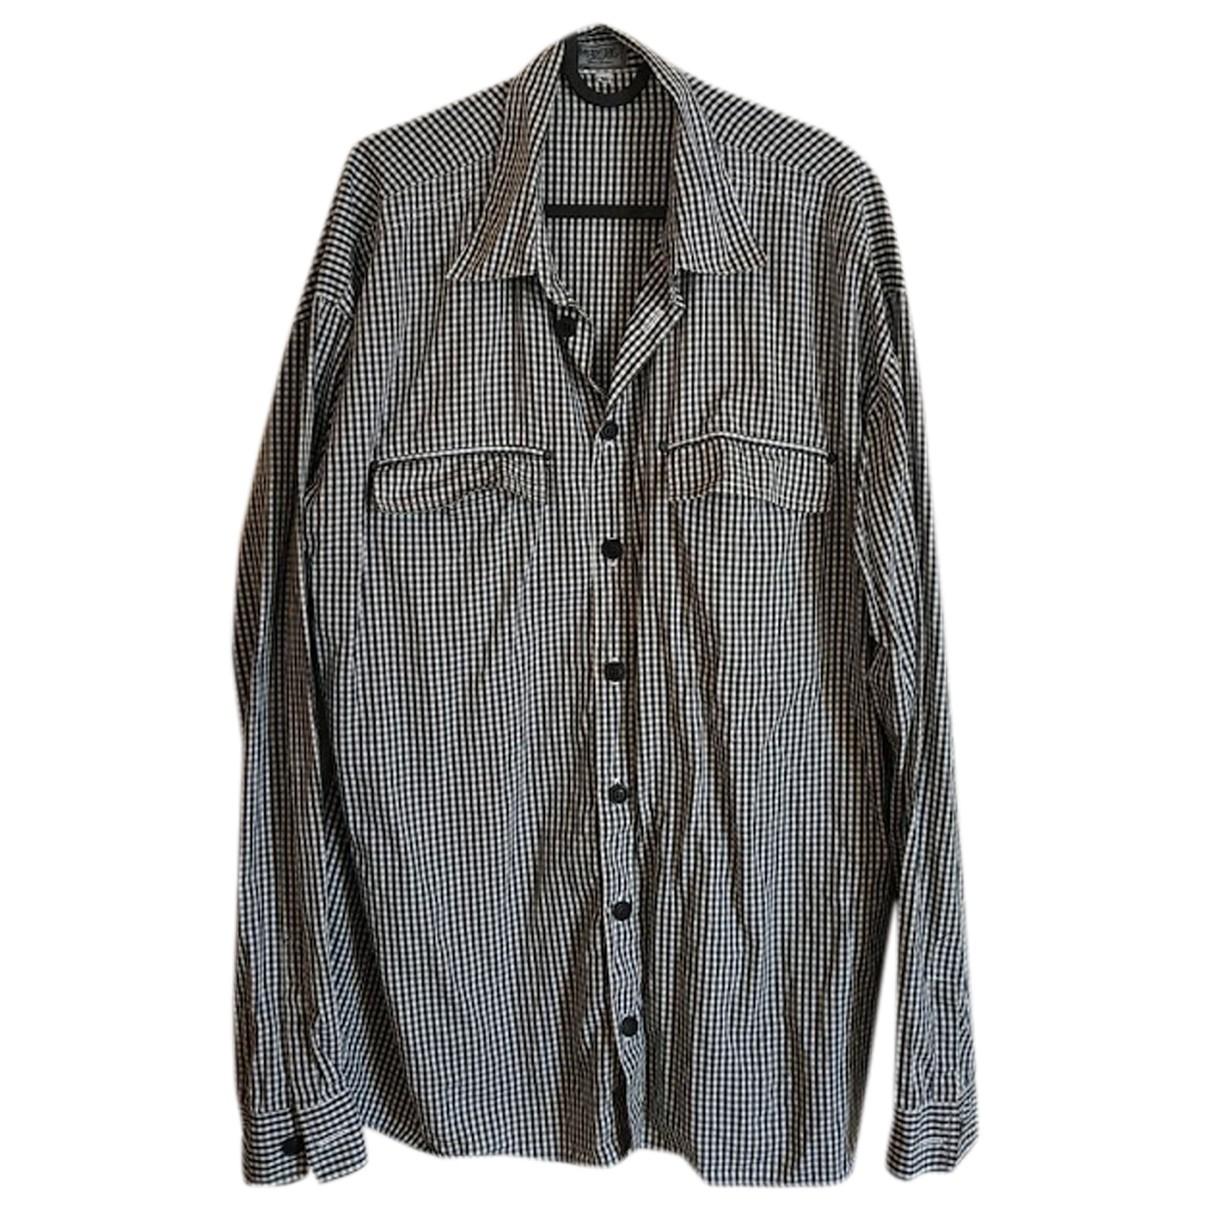 Versus \N Hemden in Baumwolle